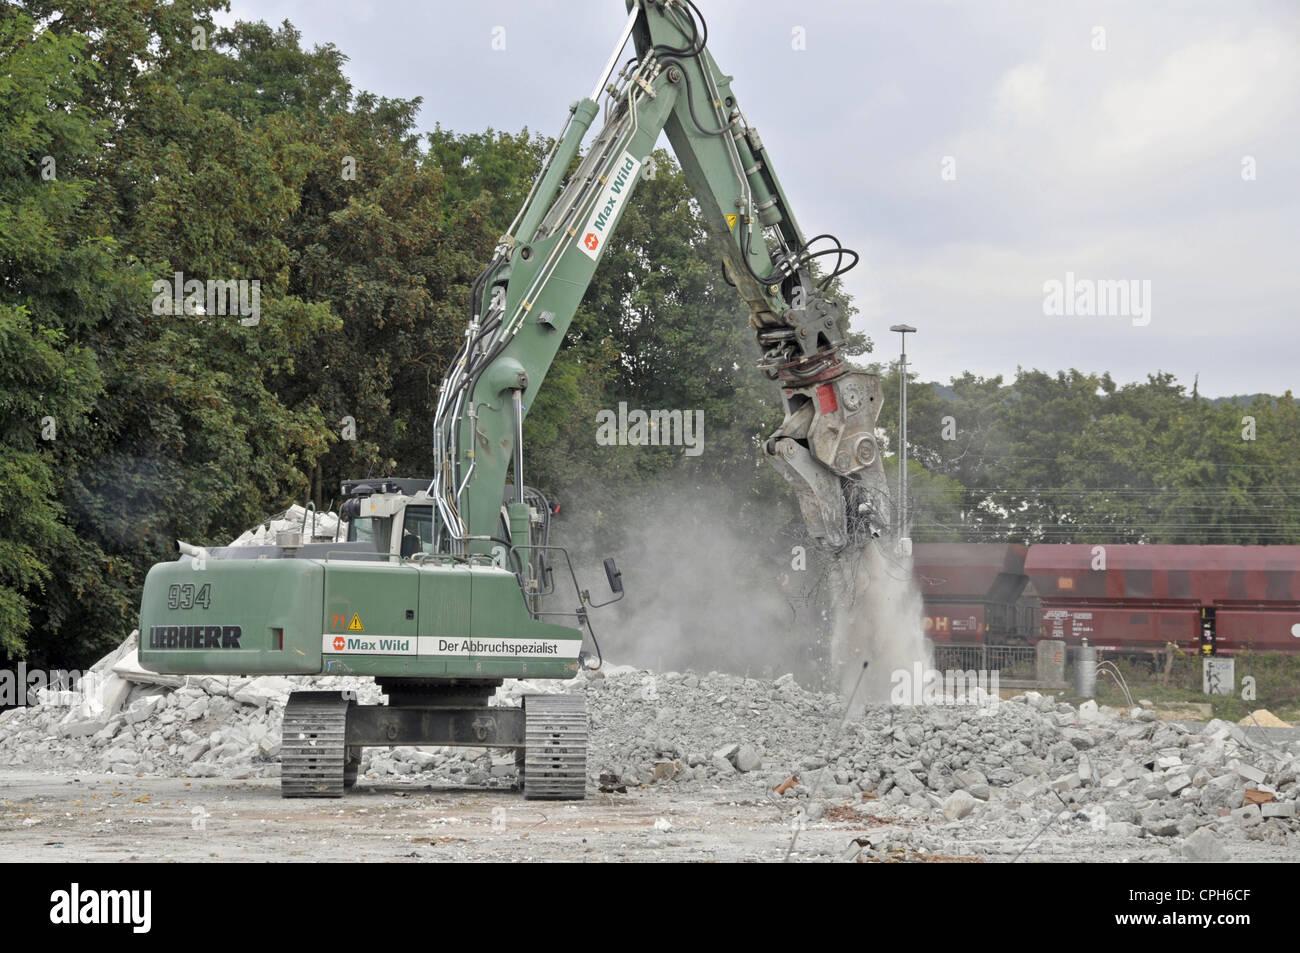 Demolition, tear off, pull down, Baden, excavator, construction, build, dismantling, Germany, tear, Europe, building, - Stock Image